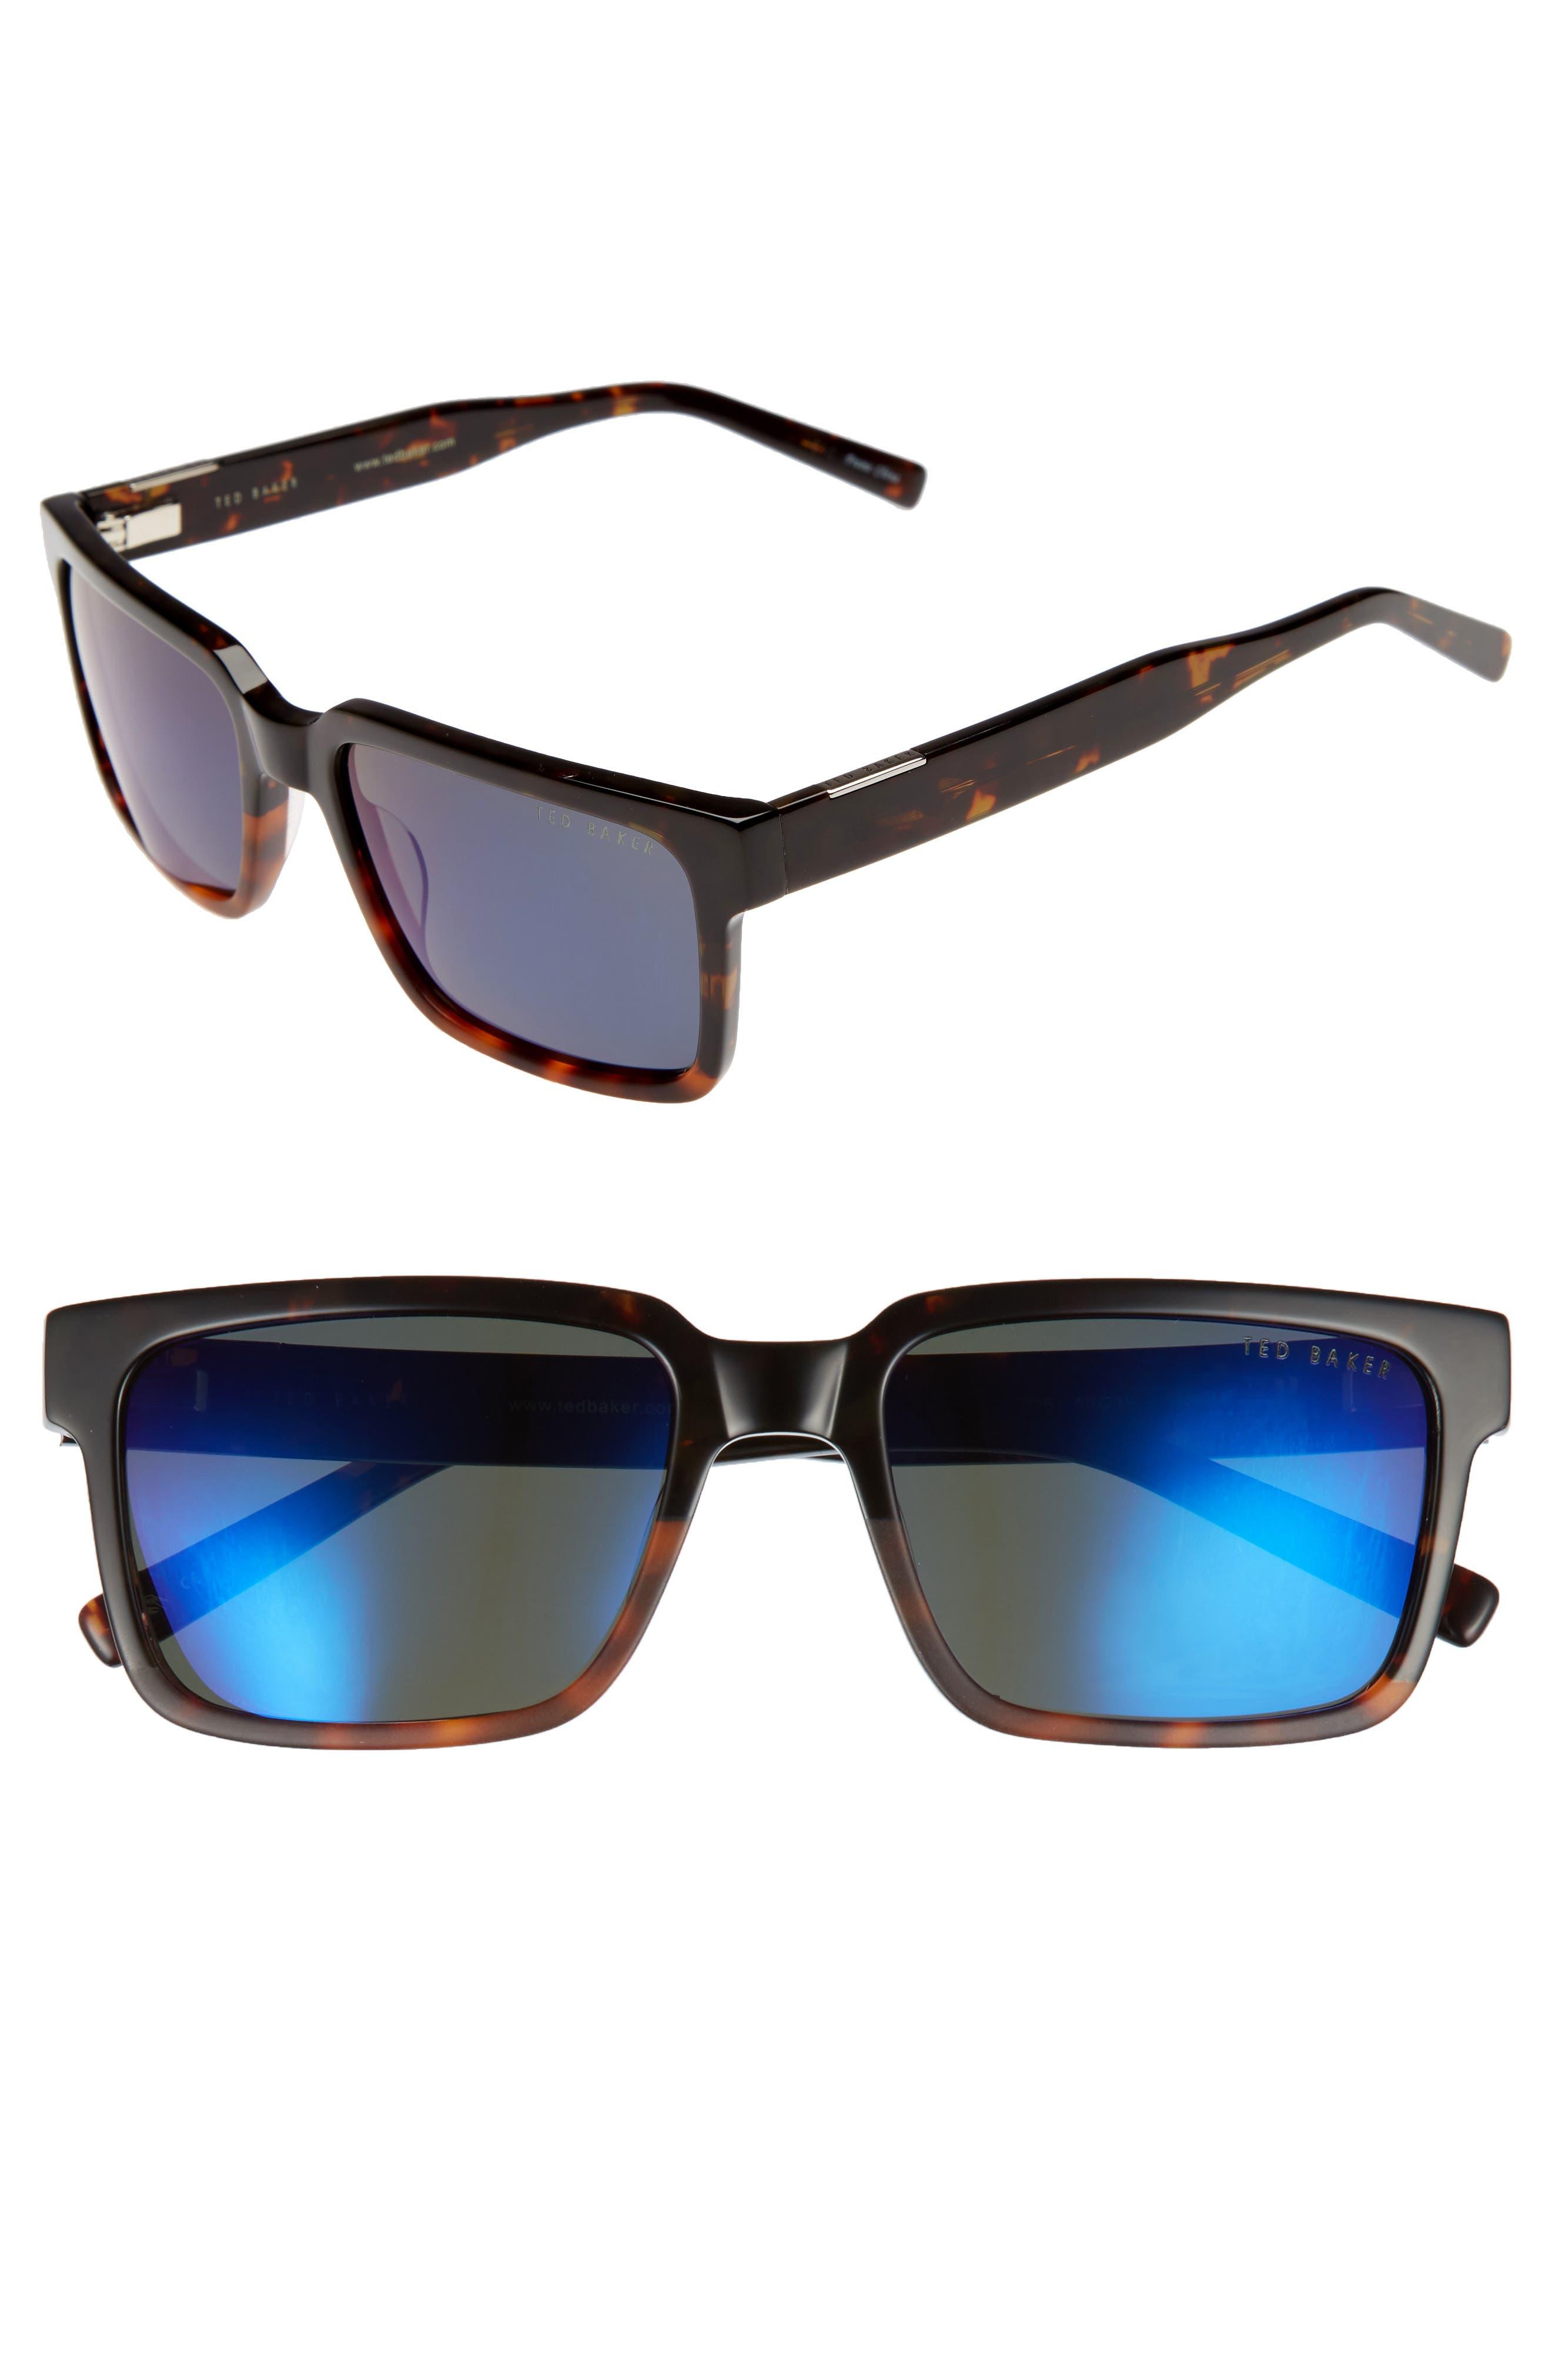 Main Image - Ted Baker London 56mm Polarized Rectangular Sunglasses